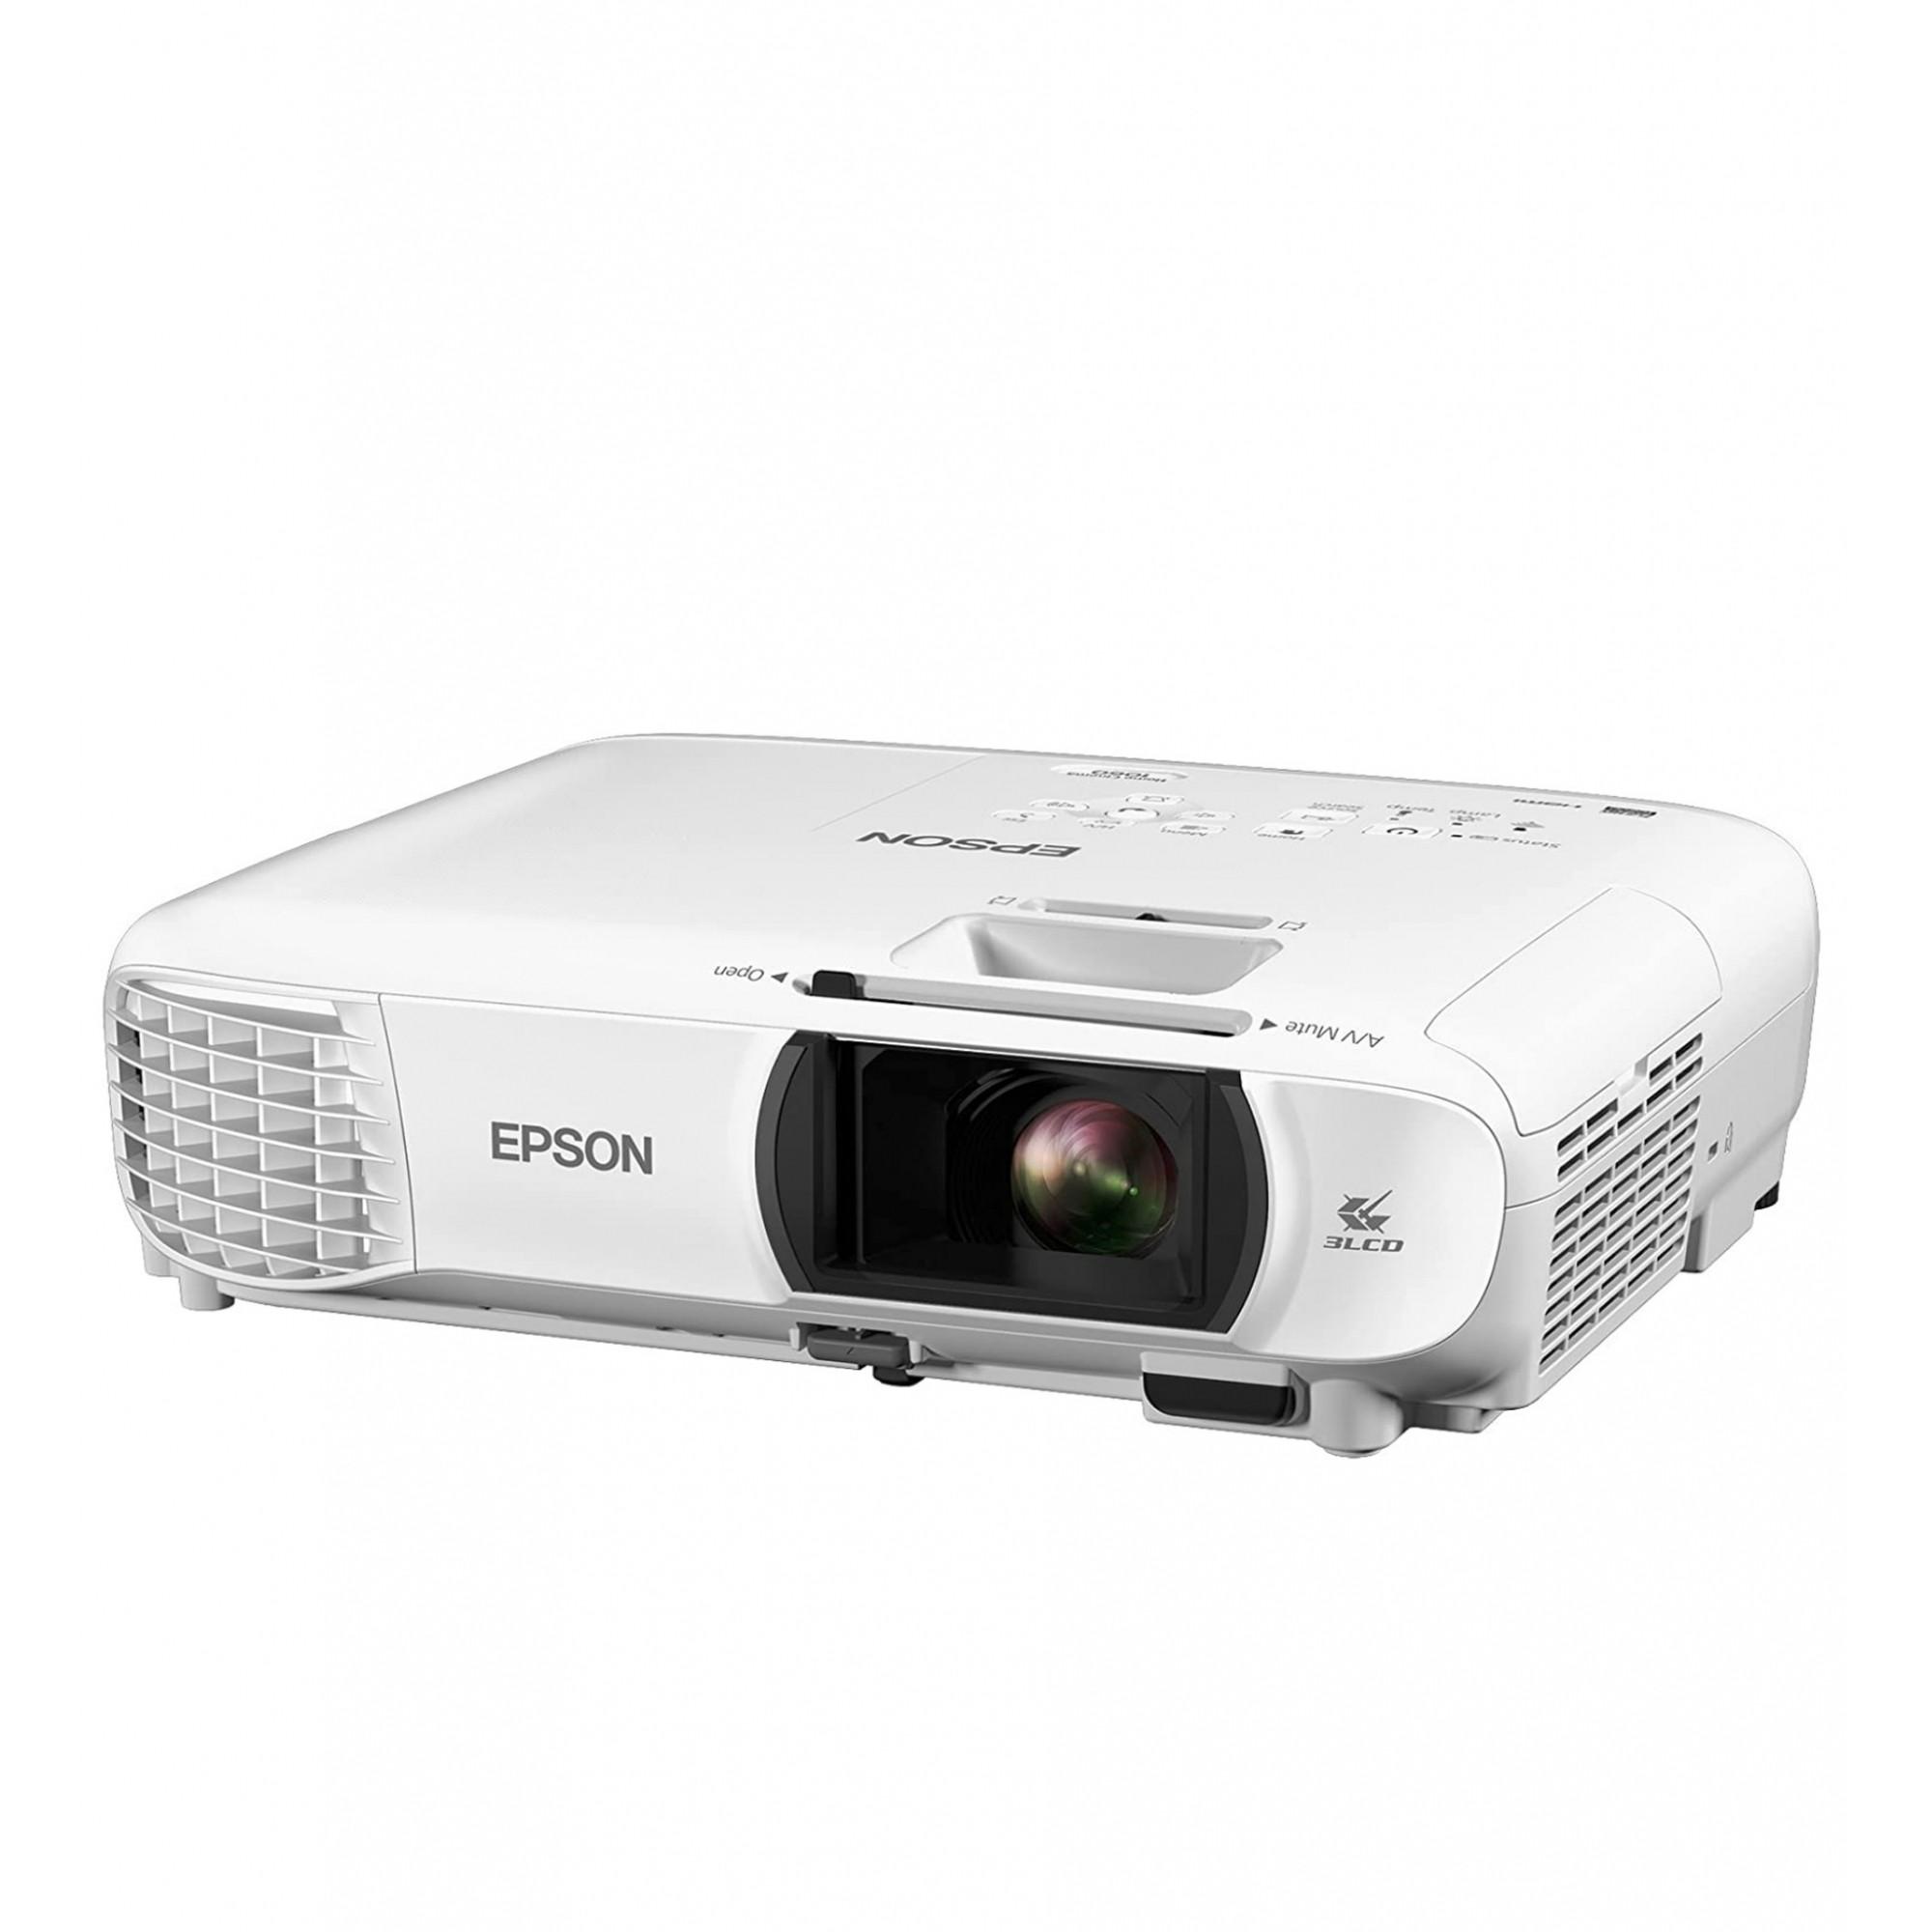 Epson 1060 Home Cinema - Projetor Cinema Full Hd Nf-e